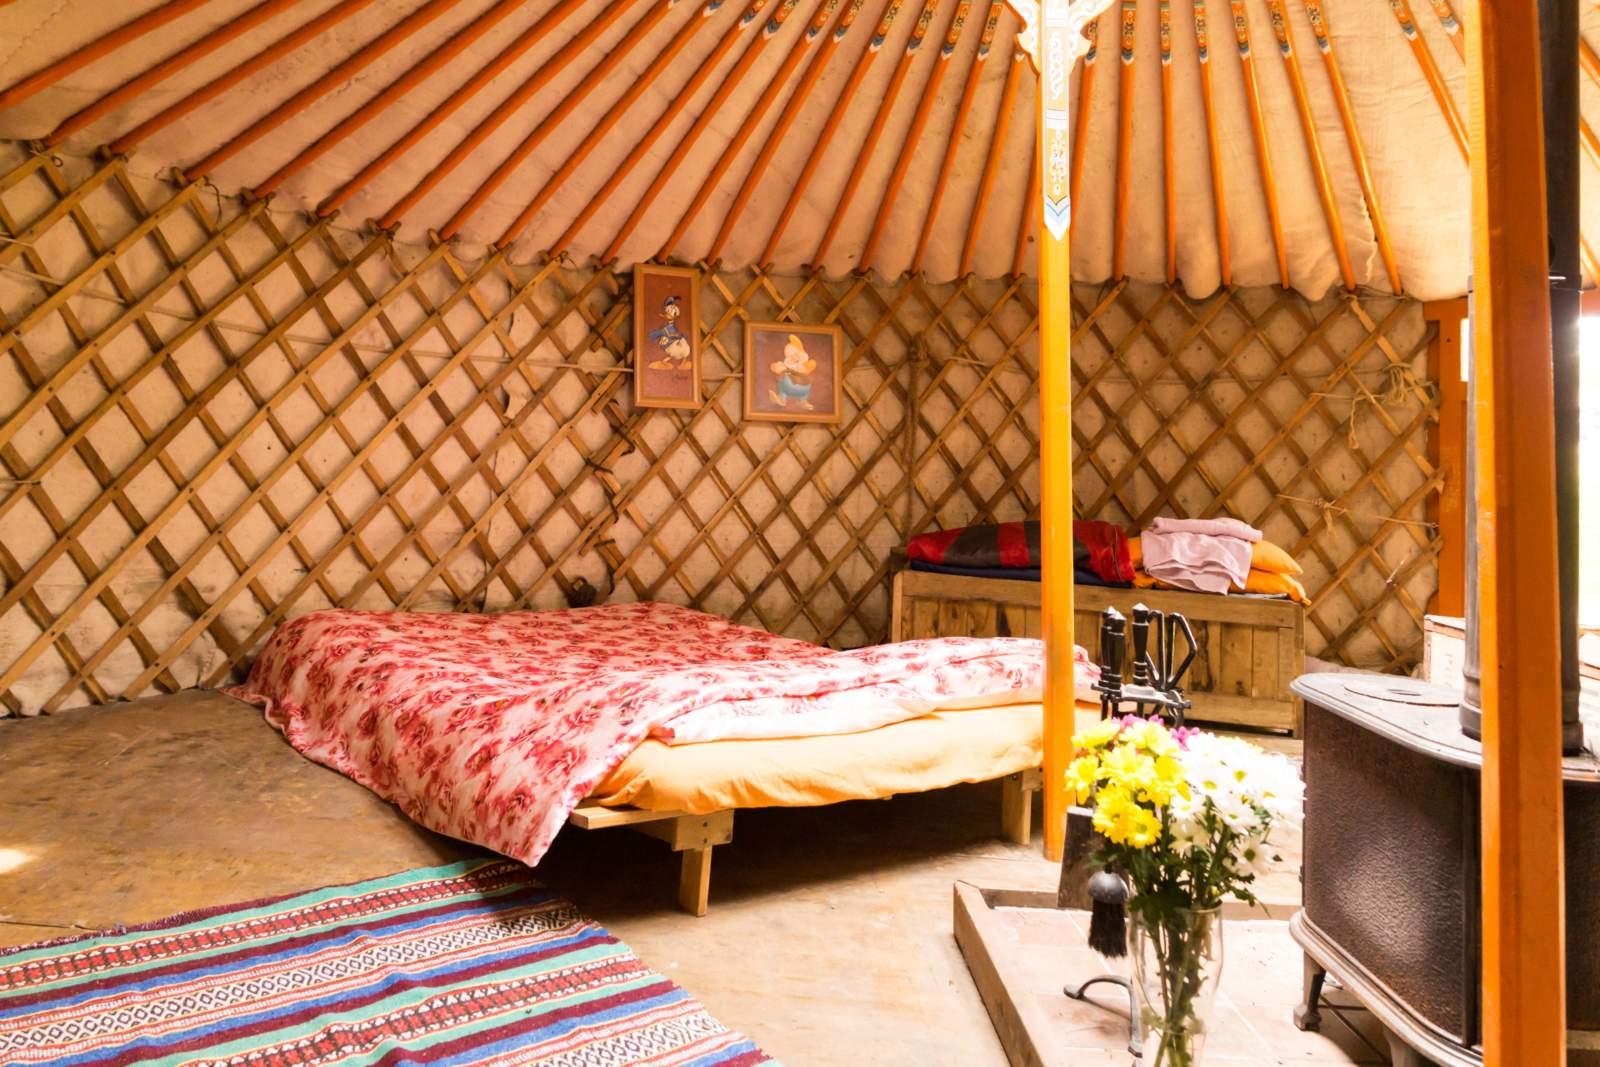 Deerswood yurt